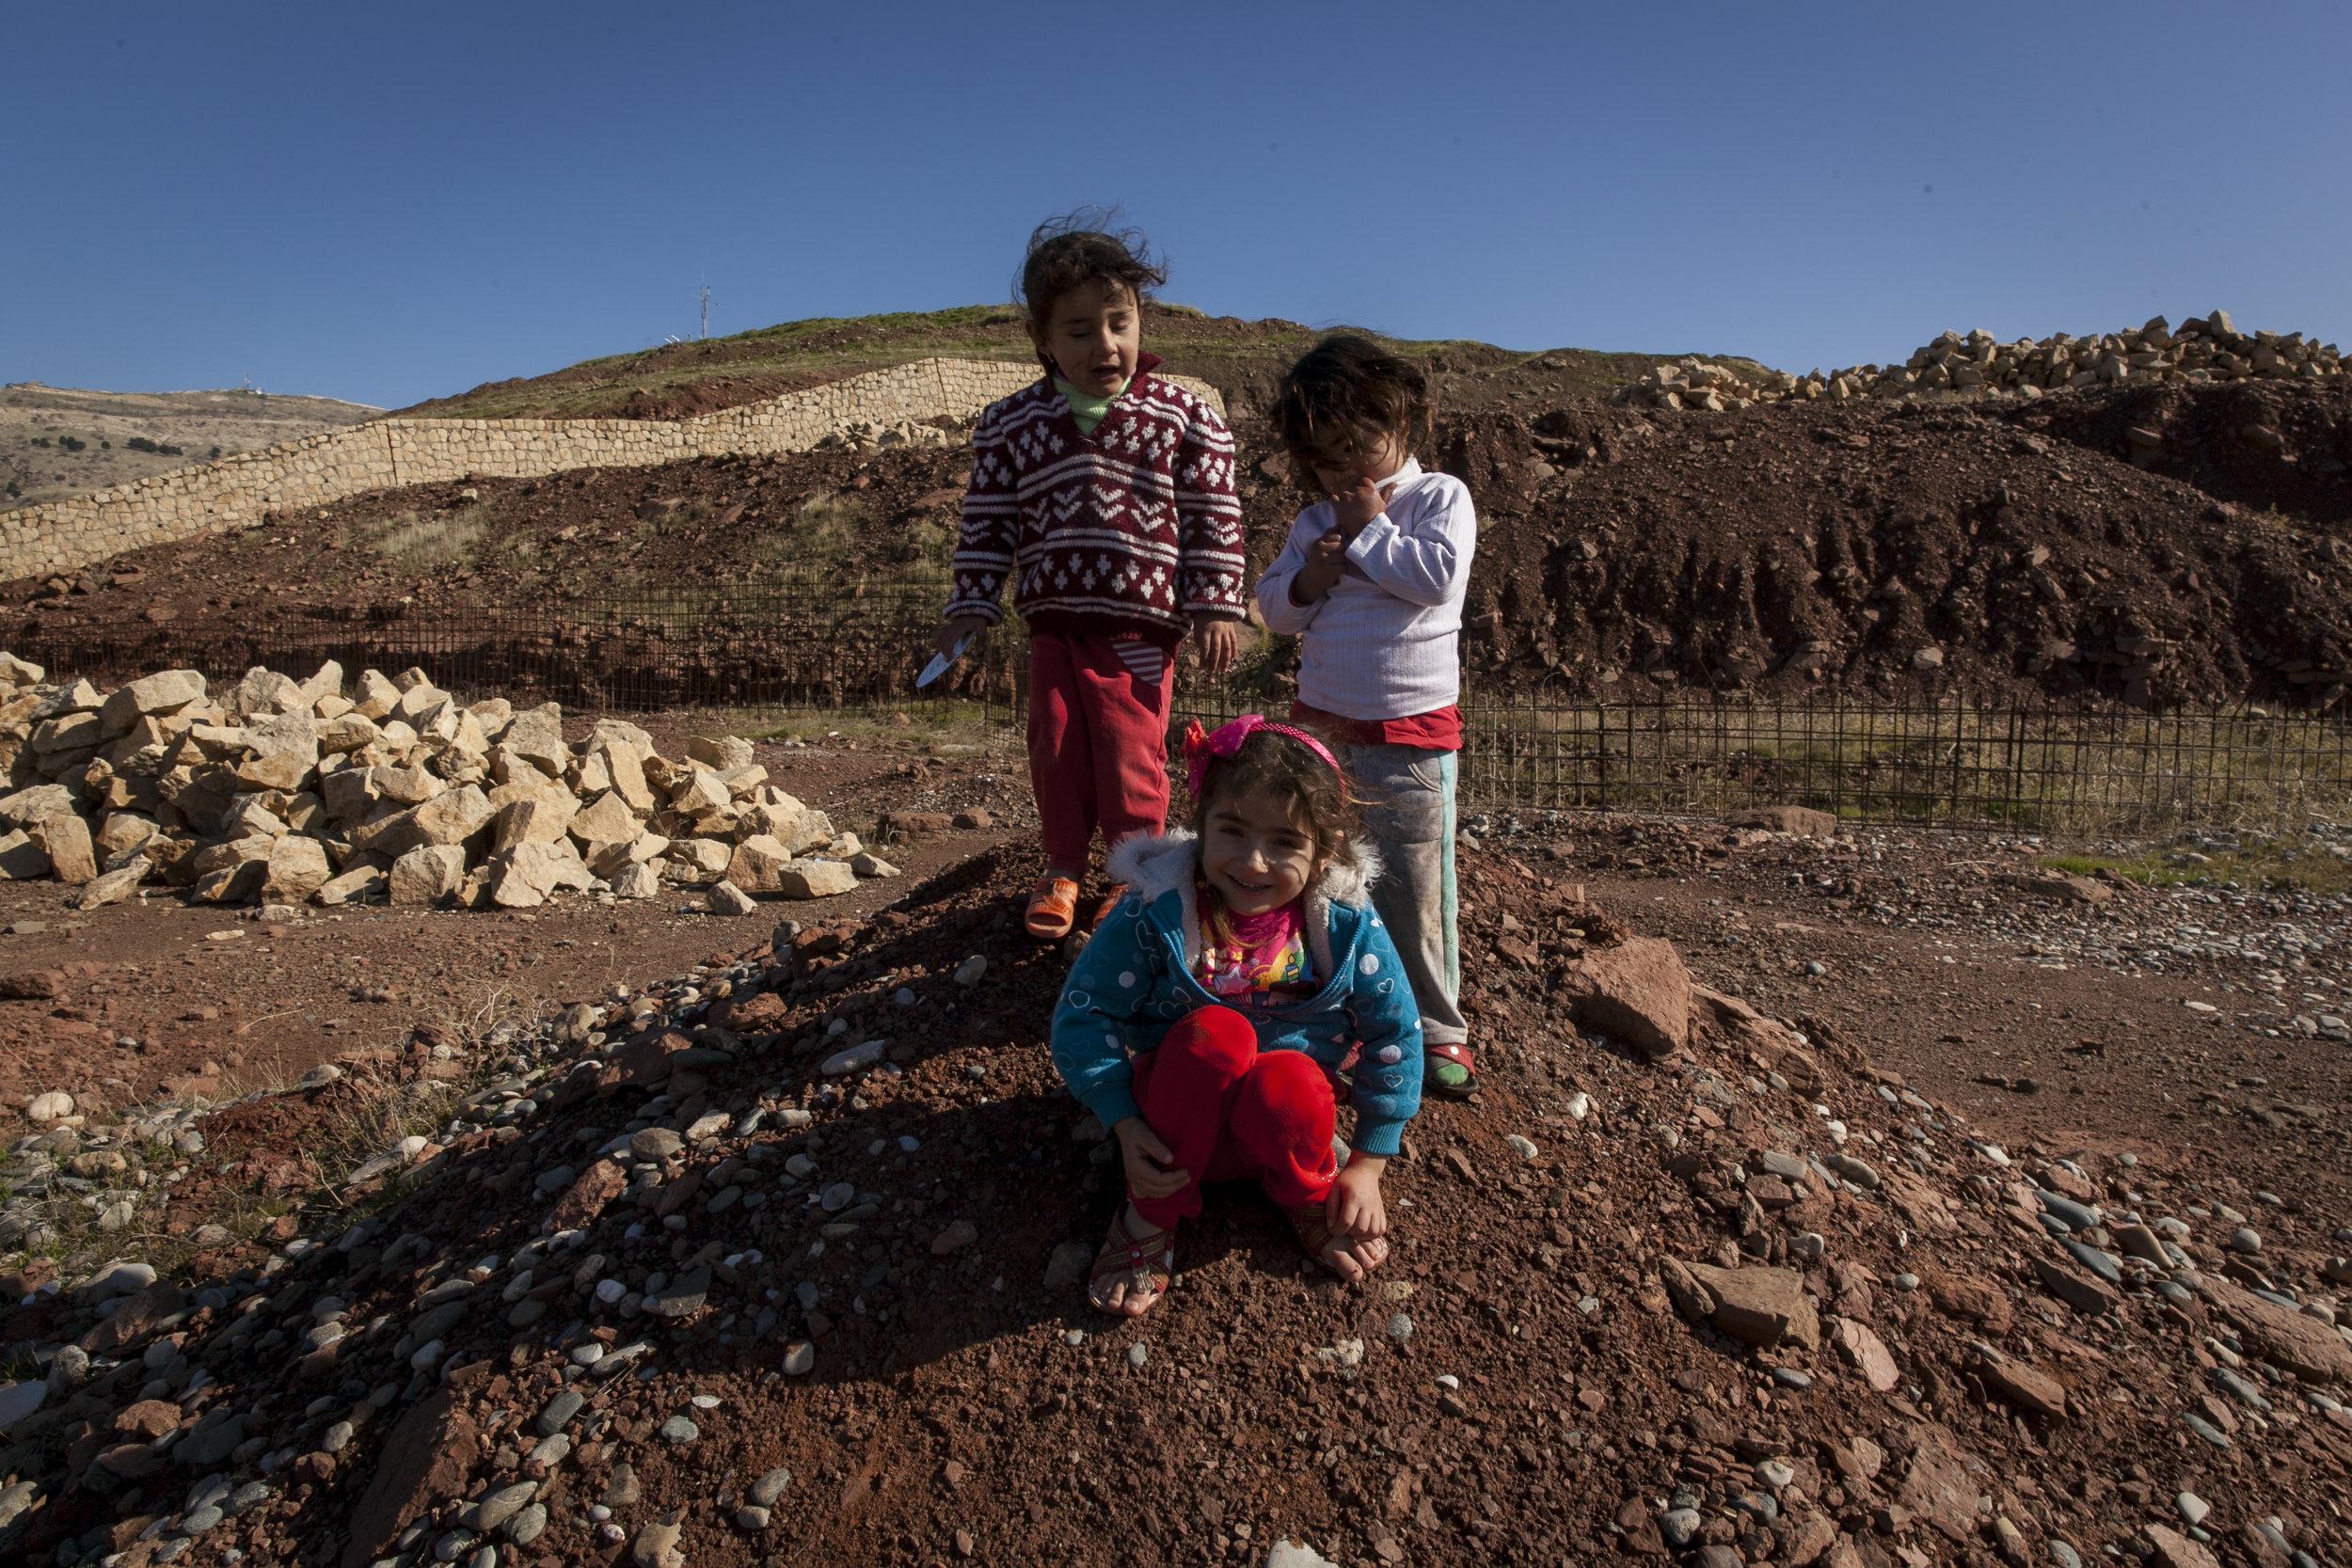 20141204_Refugees_GH_0050.jpg